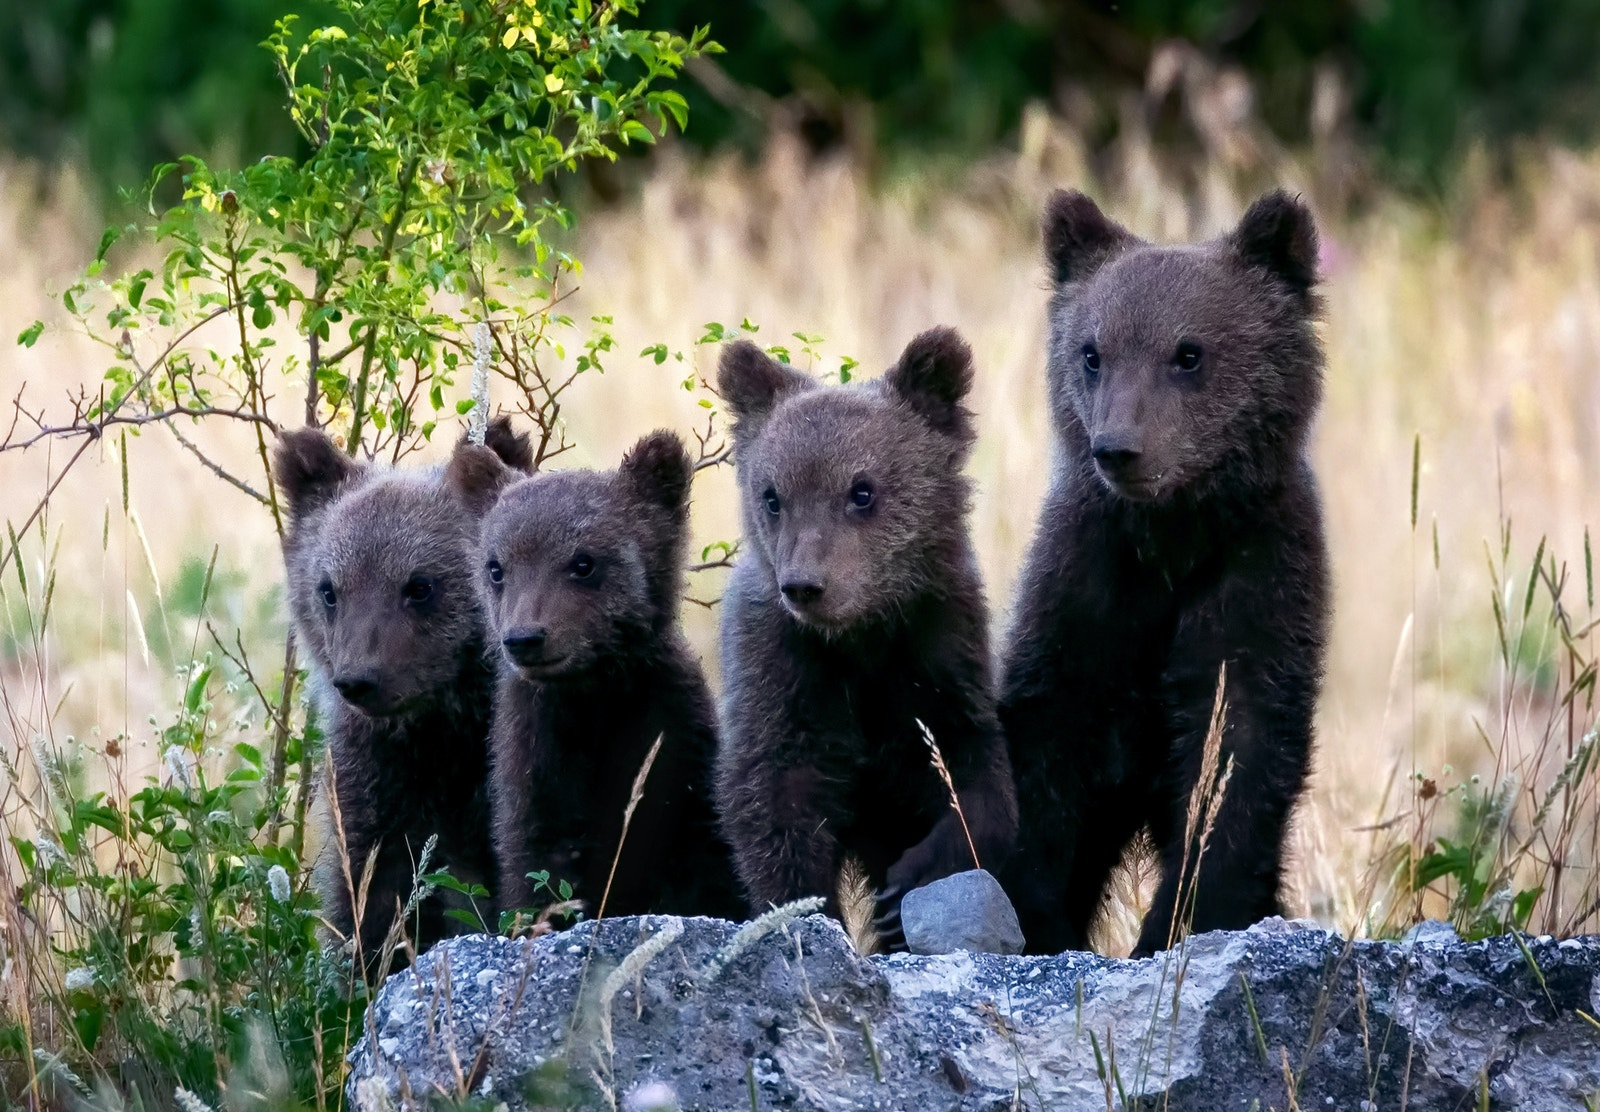 Marsican bear cubs